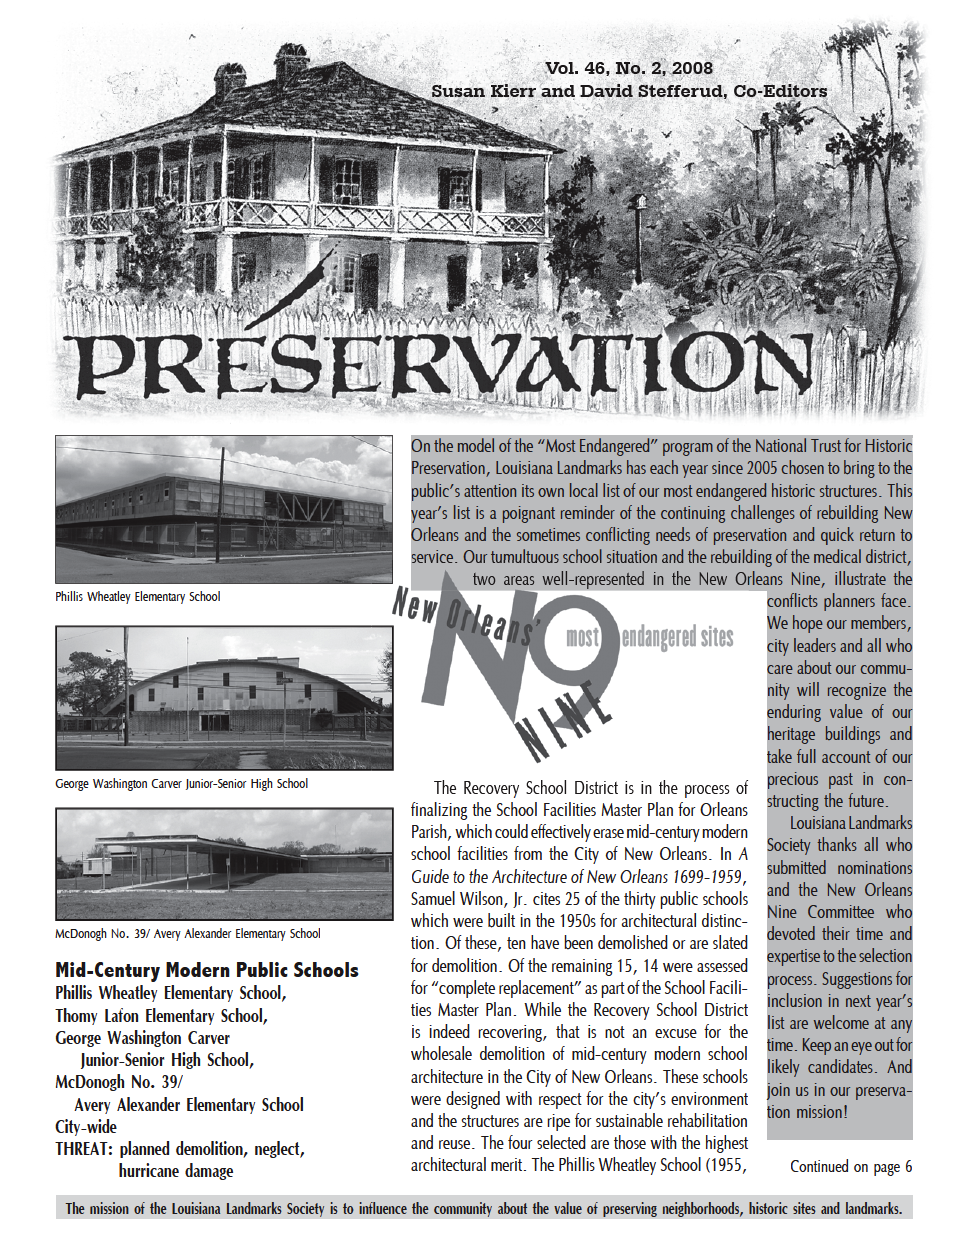 Vol. 46, No. 2, 2008